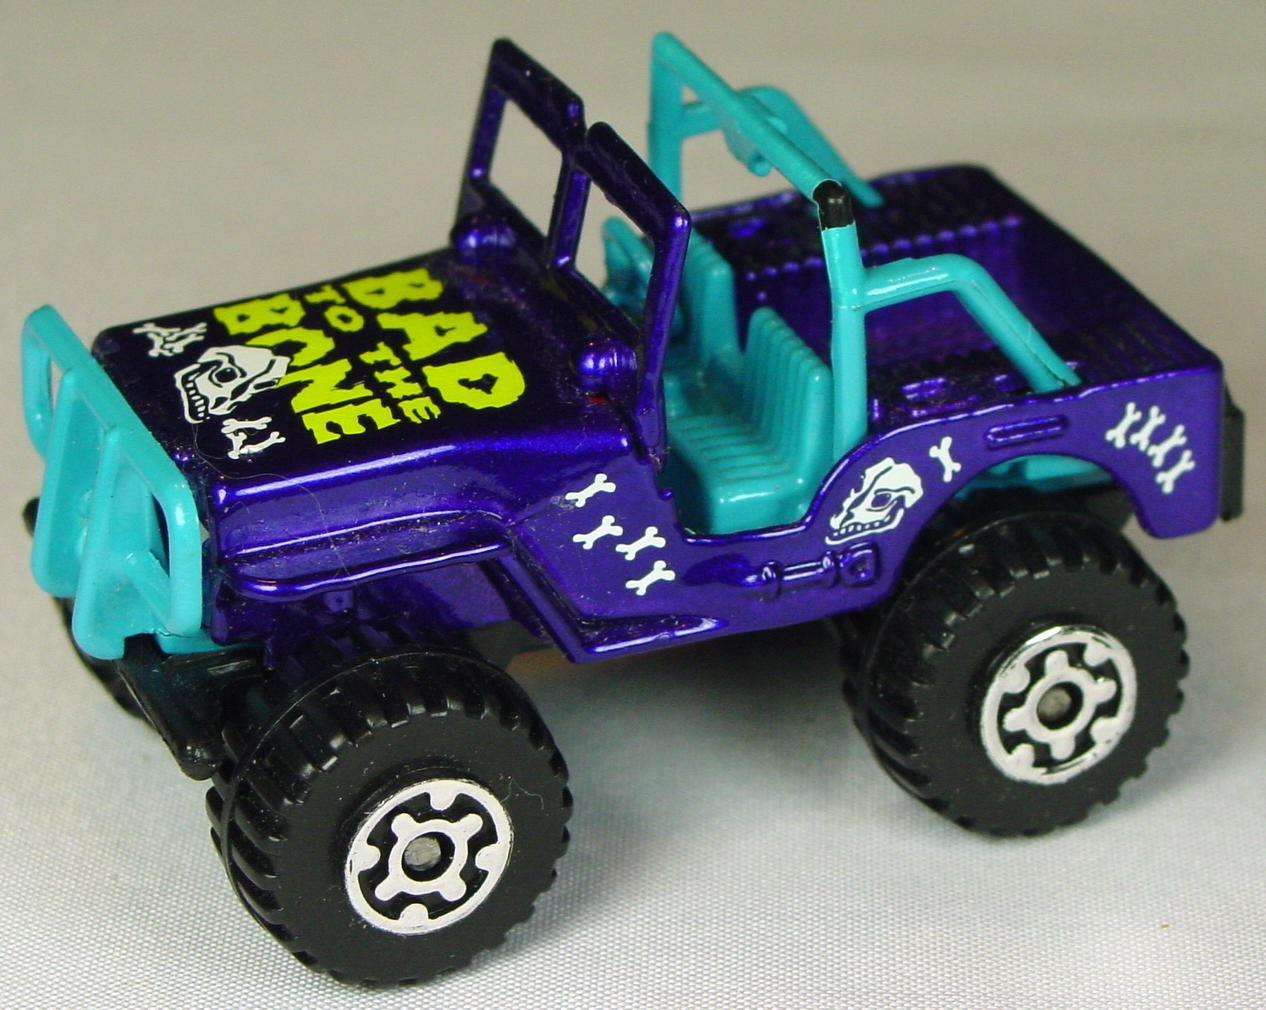 Pre-production 05 D 18 - Jeep 4x4 dark Purple Bad Bone STICKER RHD made in Thailand